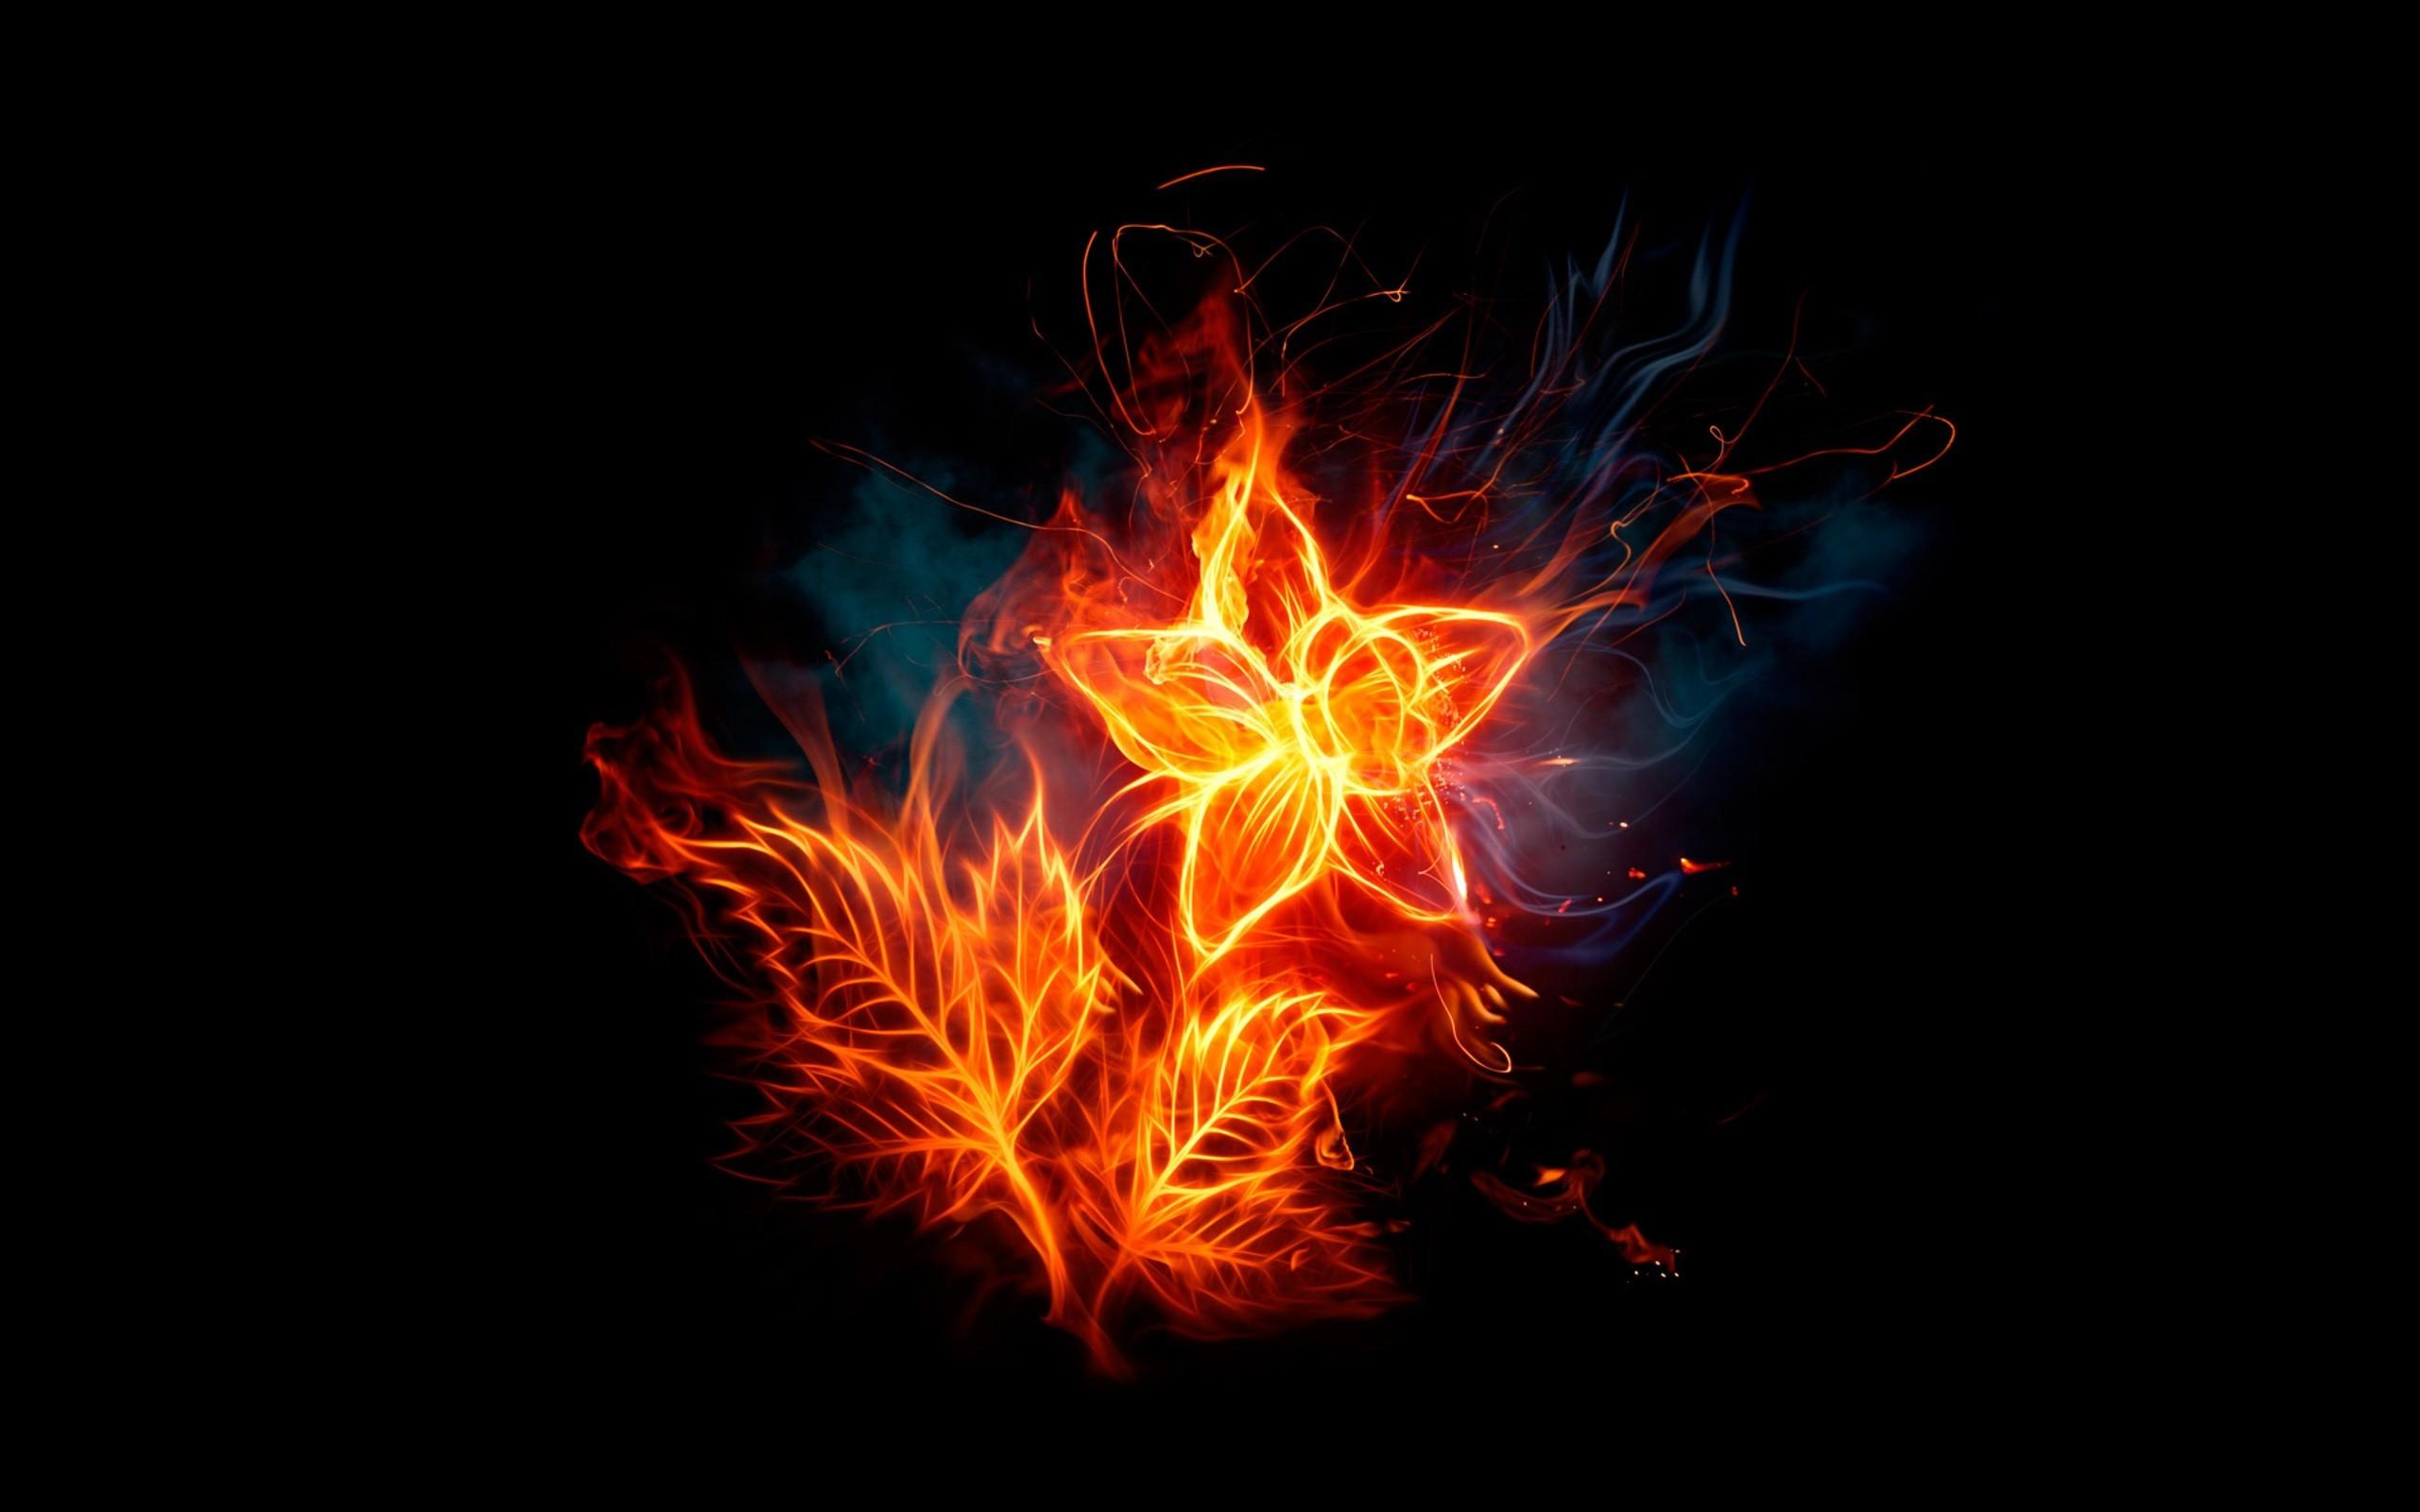 Abstract Wallpaper Fire 2560x1600